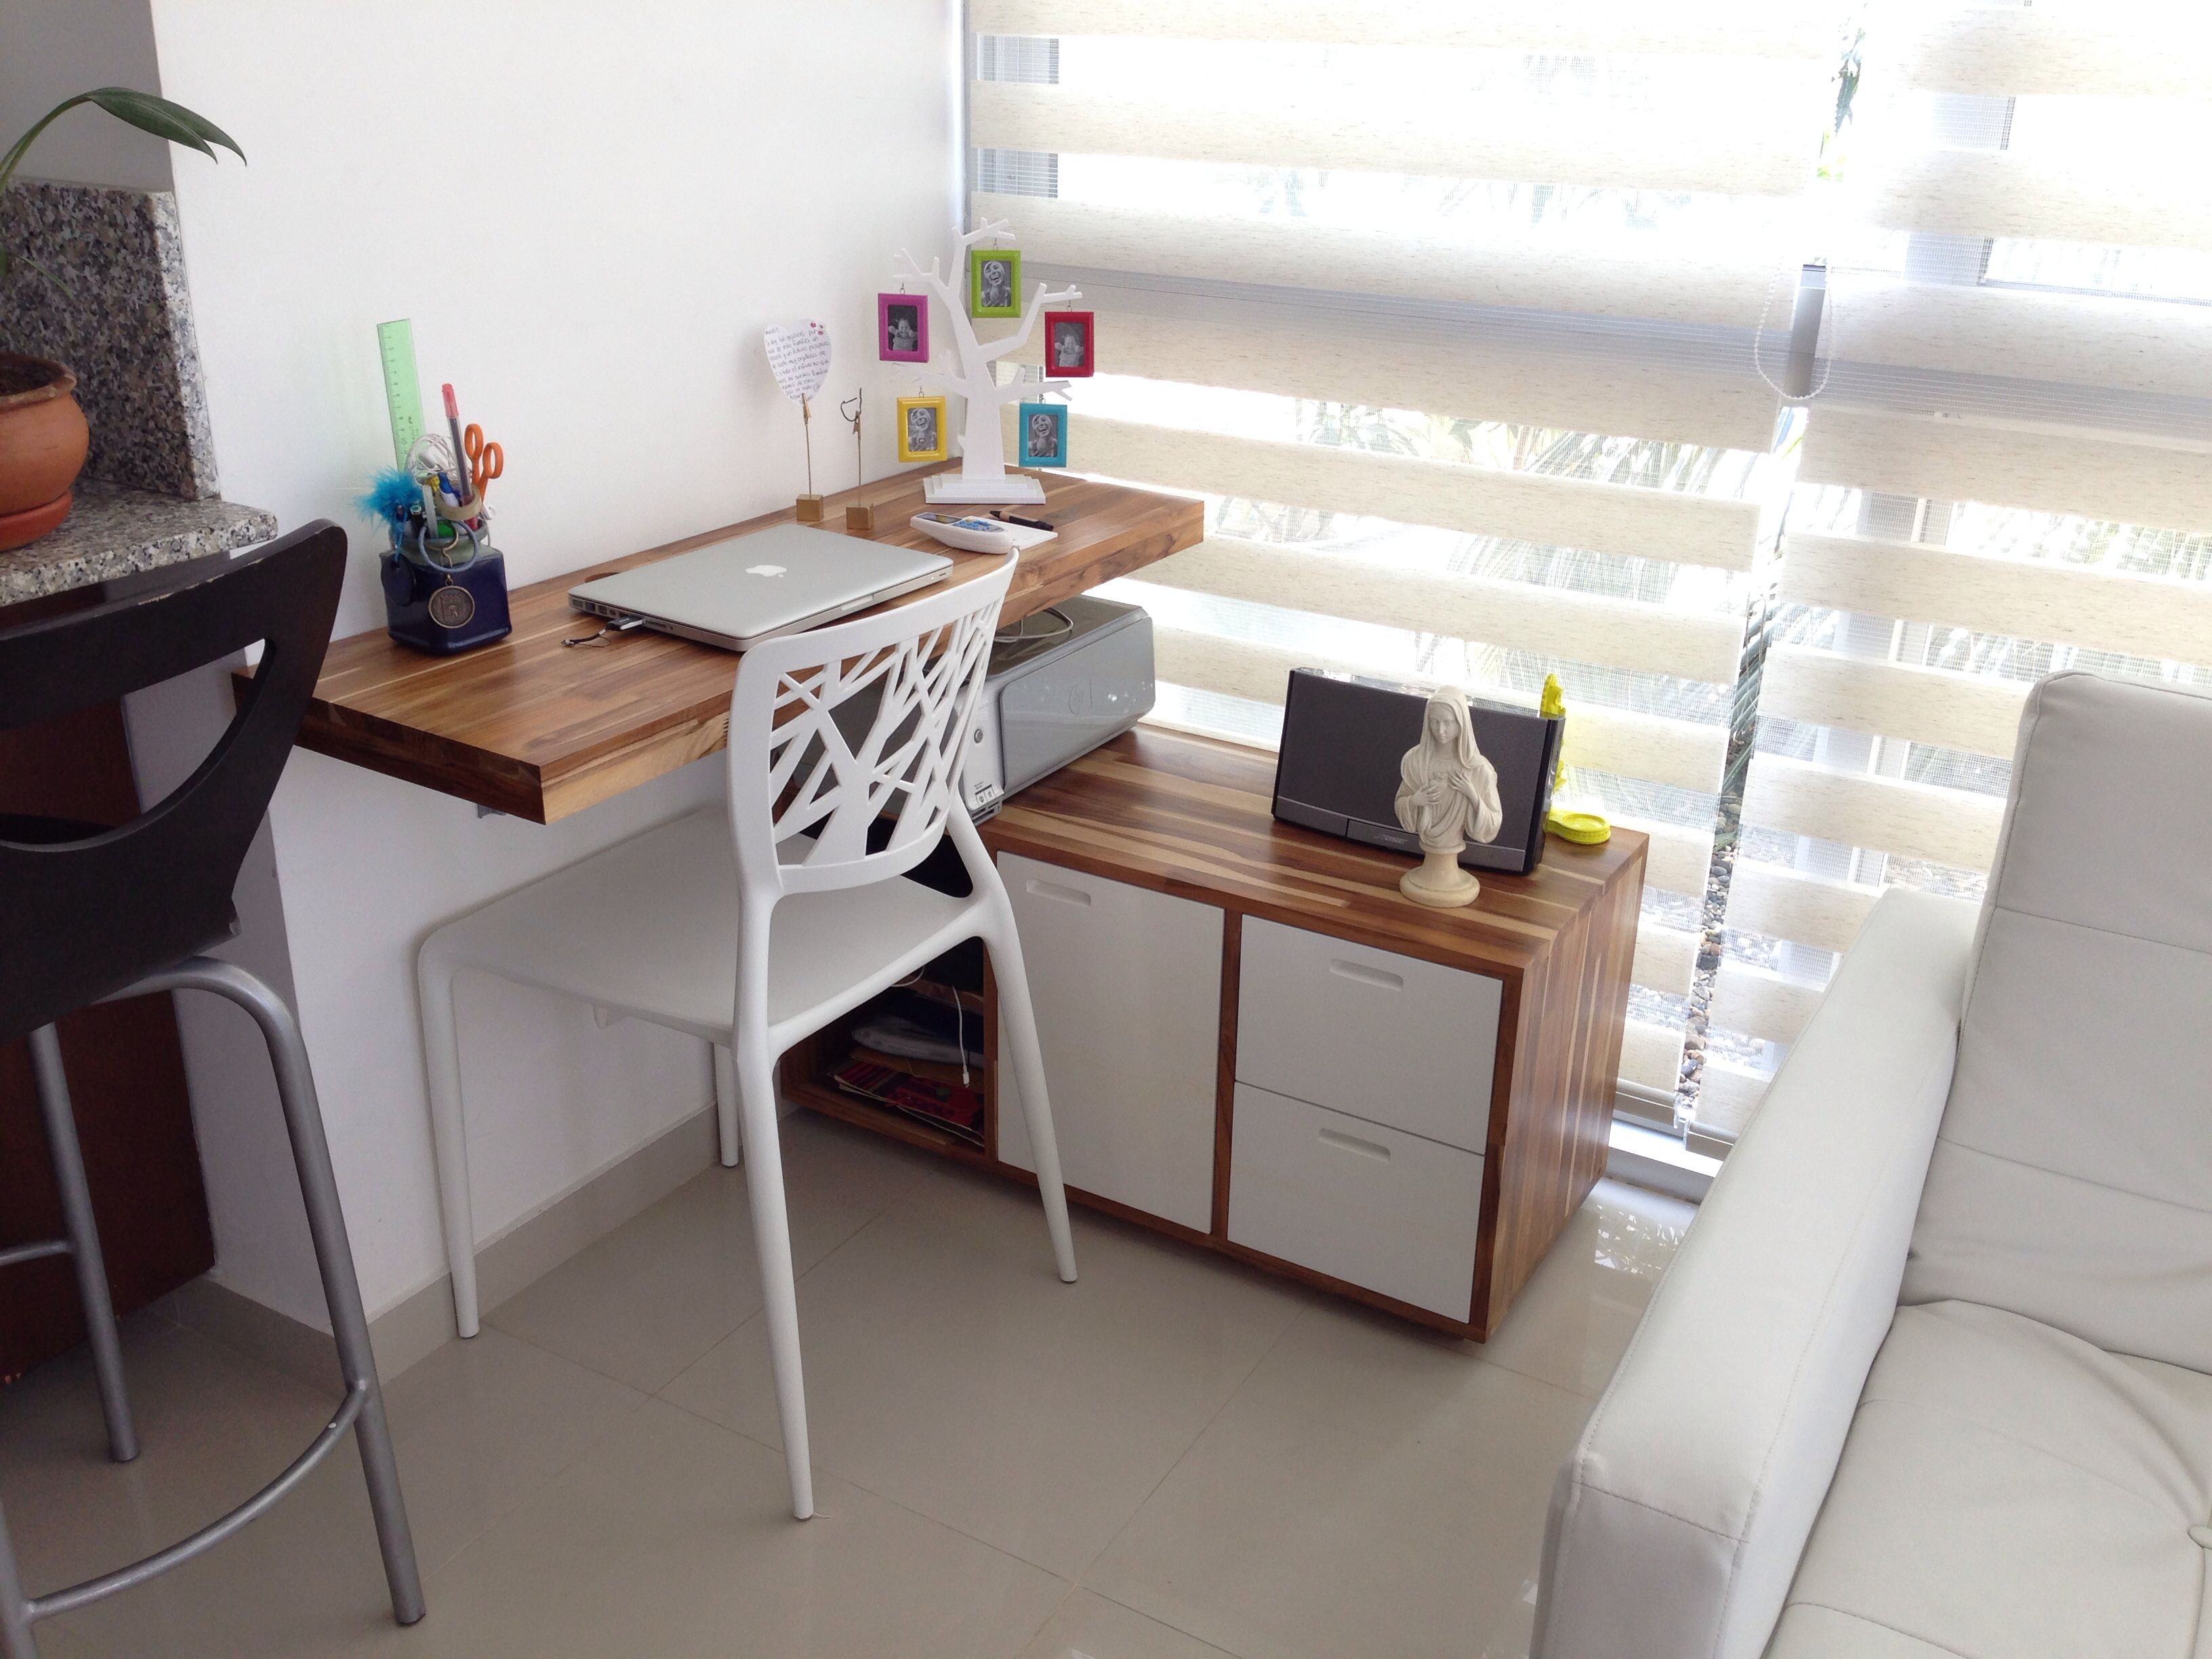 My mini office design.